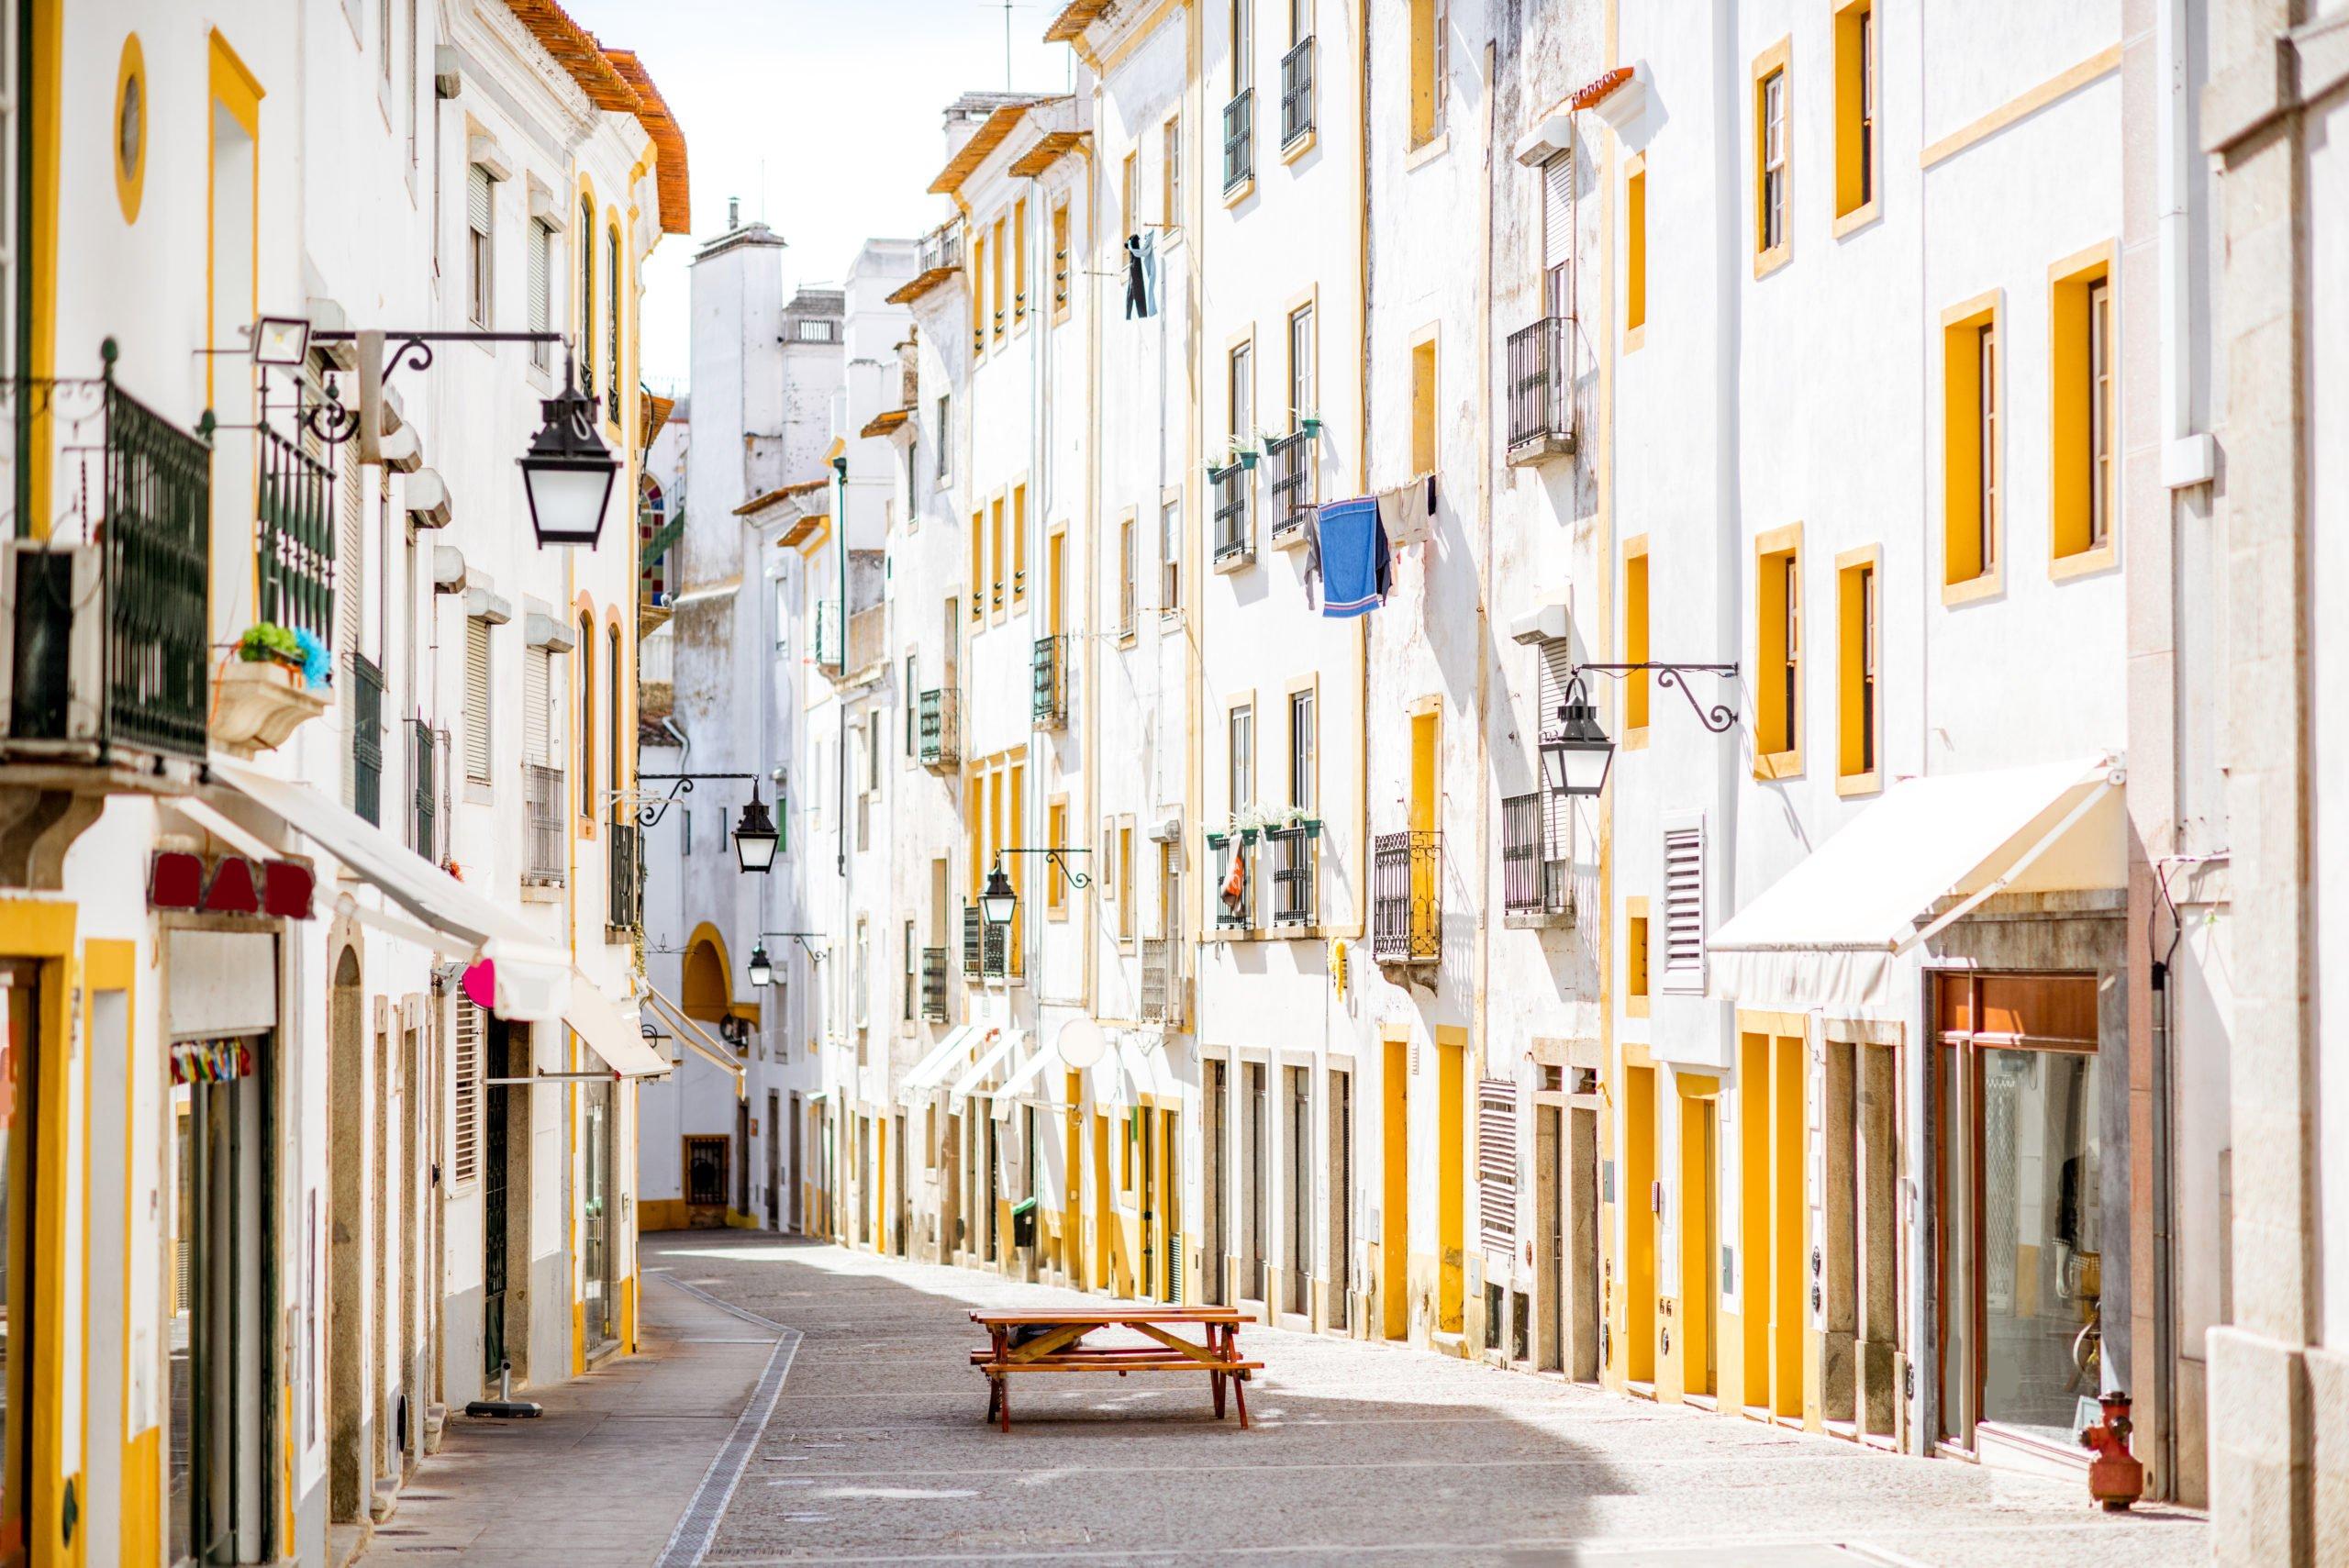 Discover The Beautifull White Houses Of Evora On Evora Wine Tasting Tour From Lisbon_59